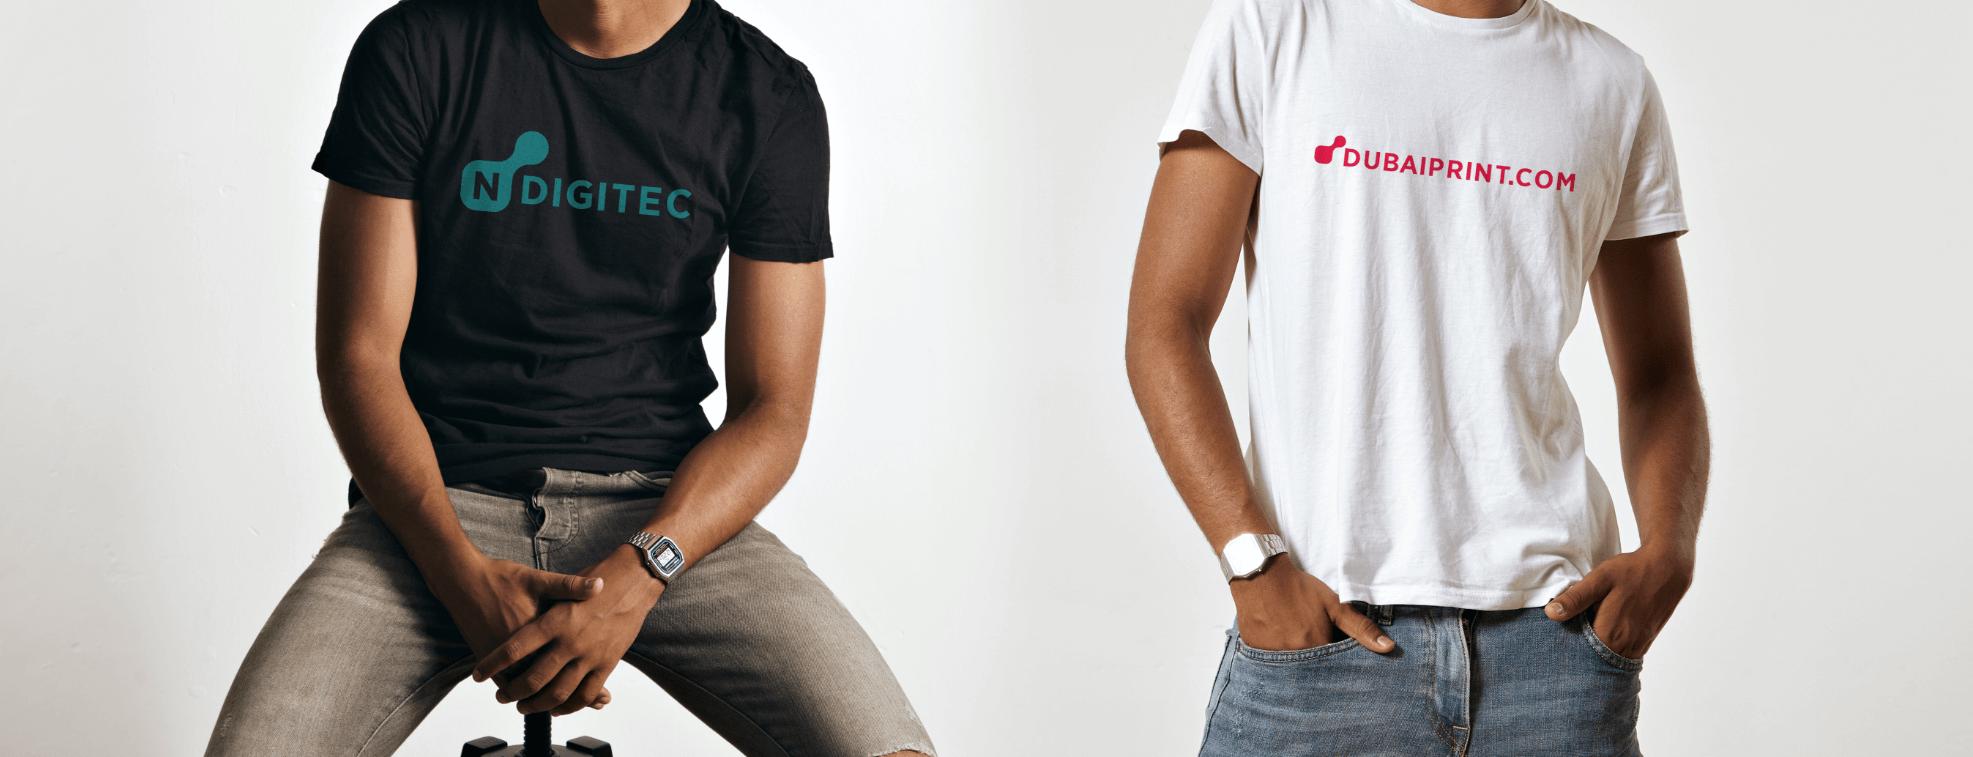 Custom-made made promotional t-shirts for Dubaiprint and NDigitec